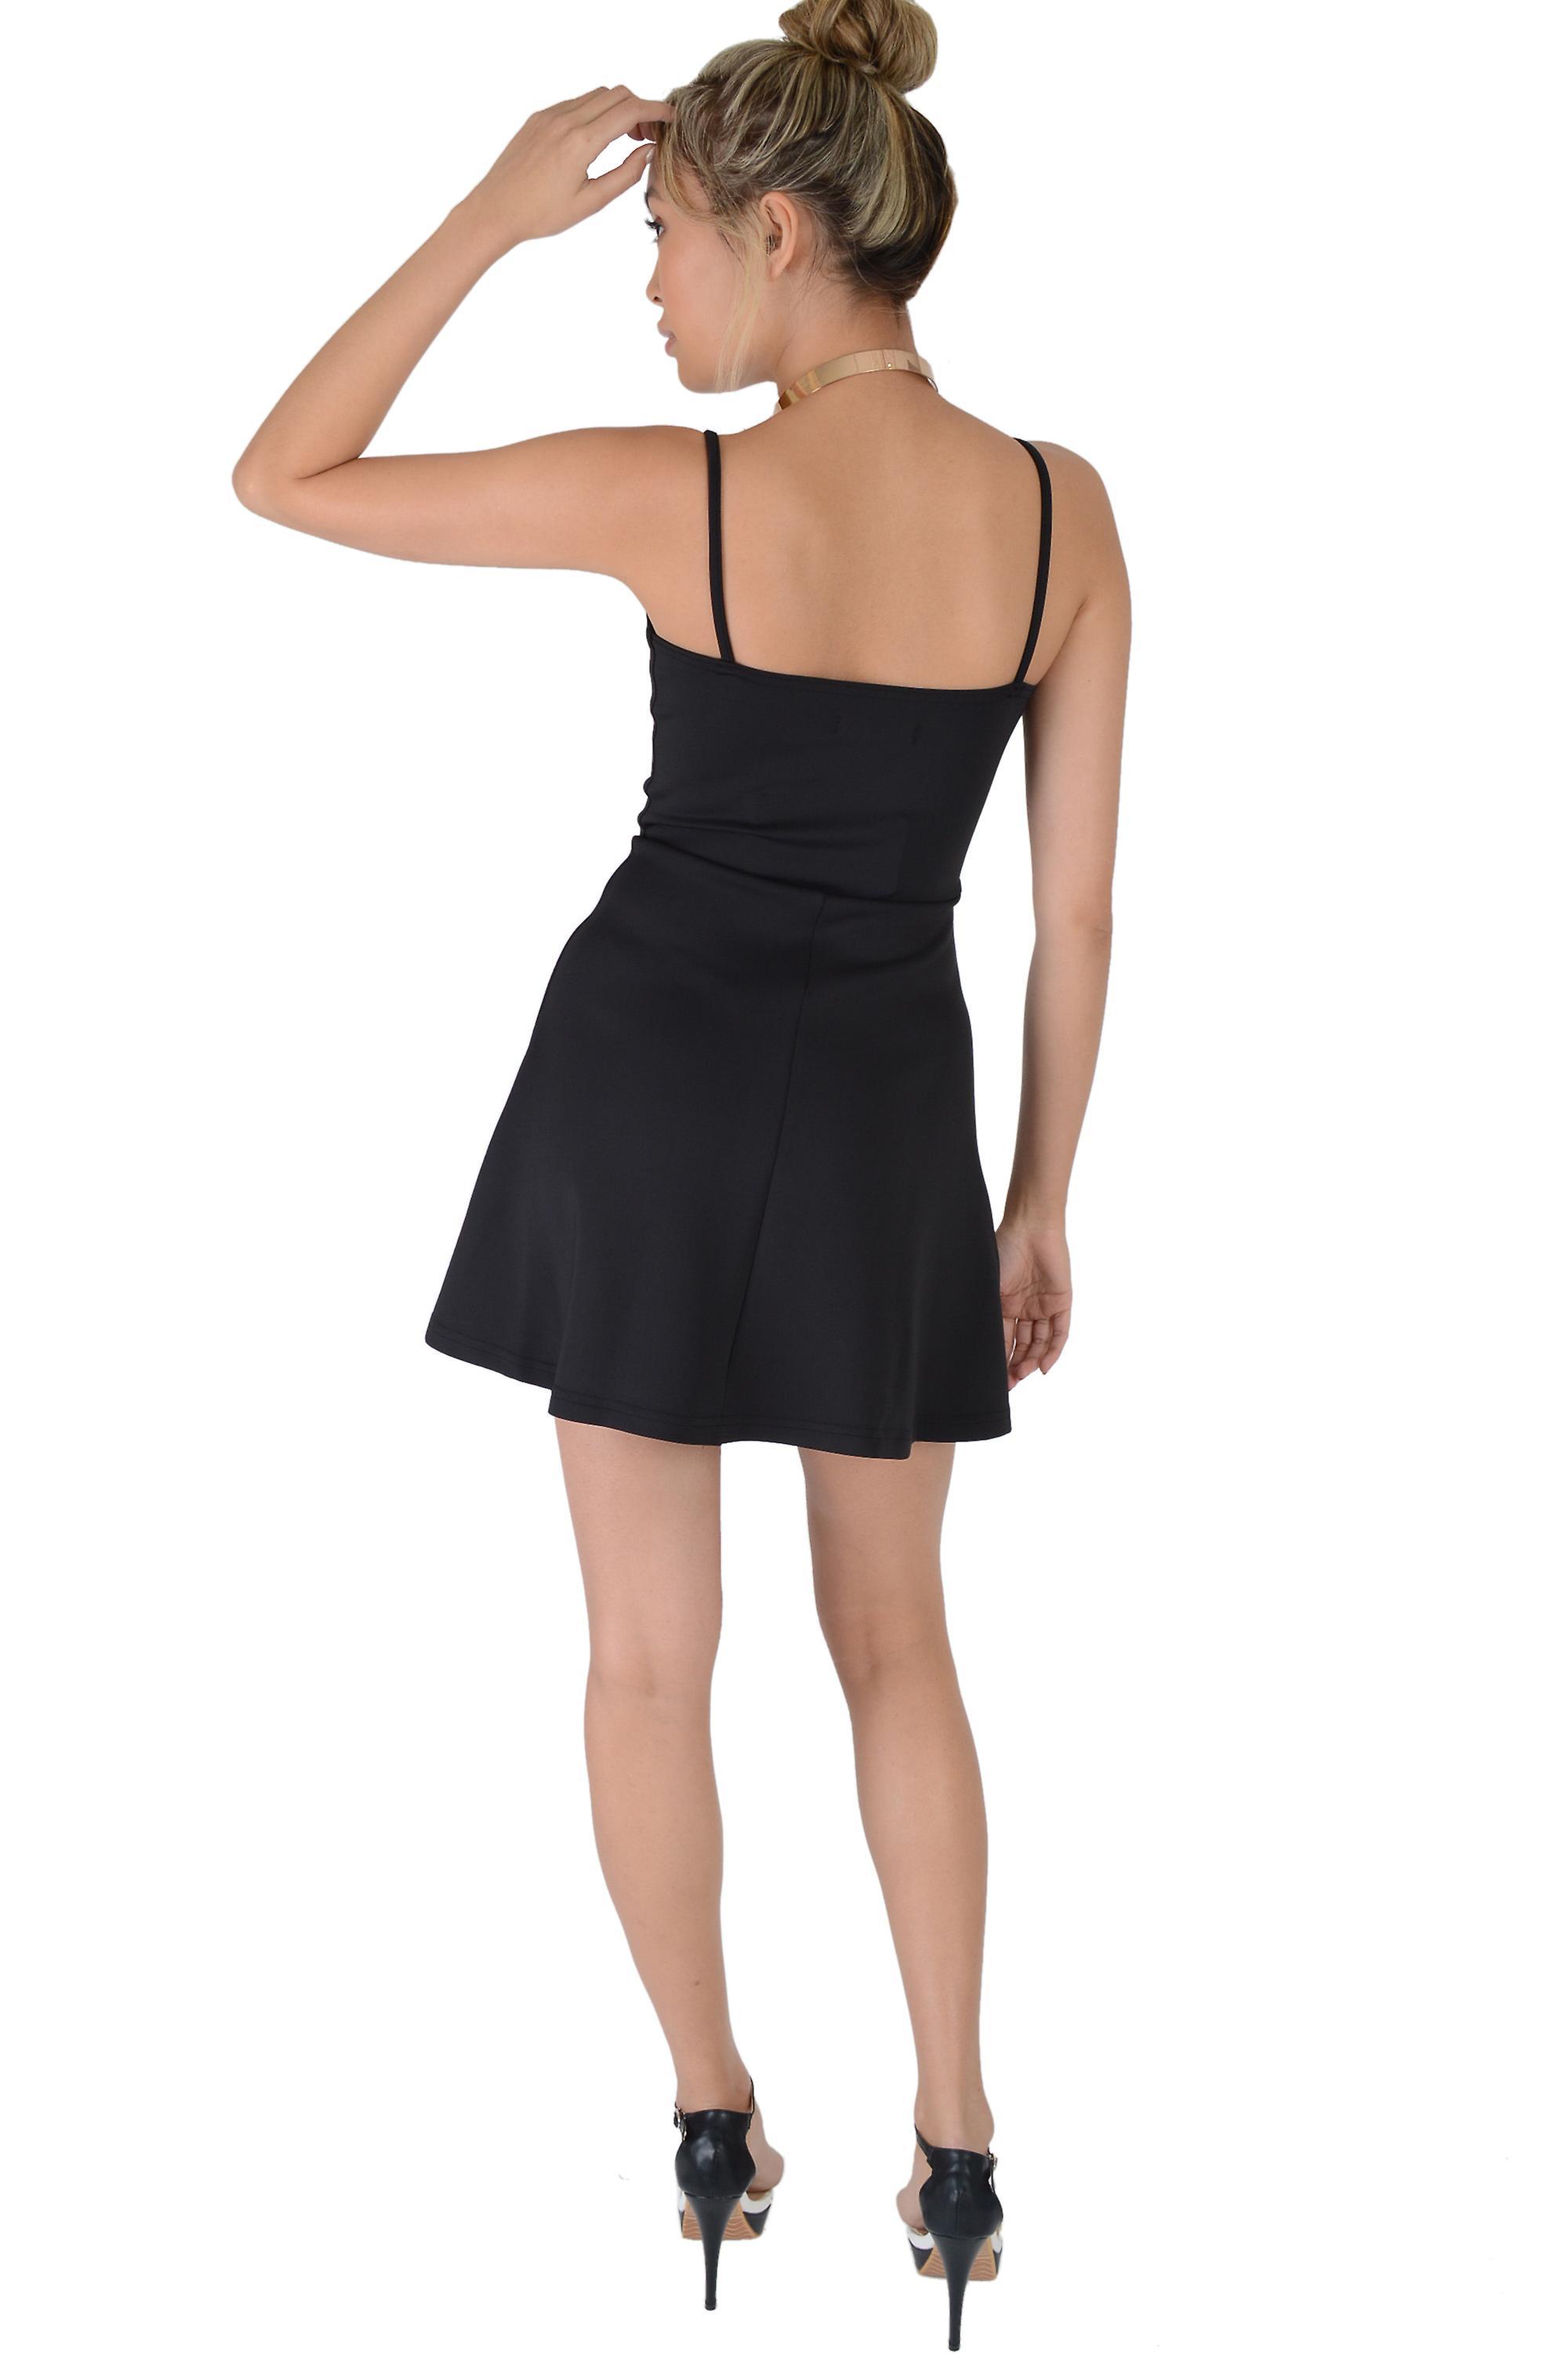 Lovemystyle Black Strappy Plunge A-Line Silk/Satin Dress